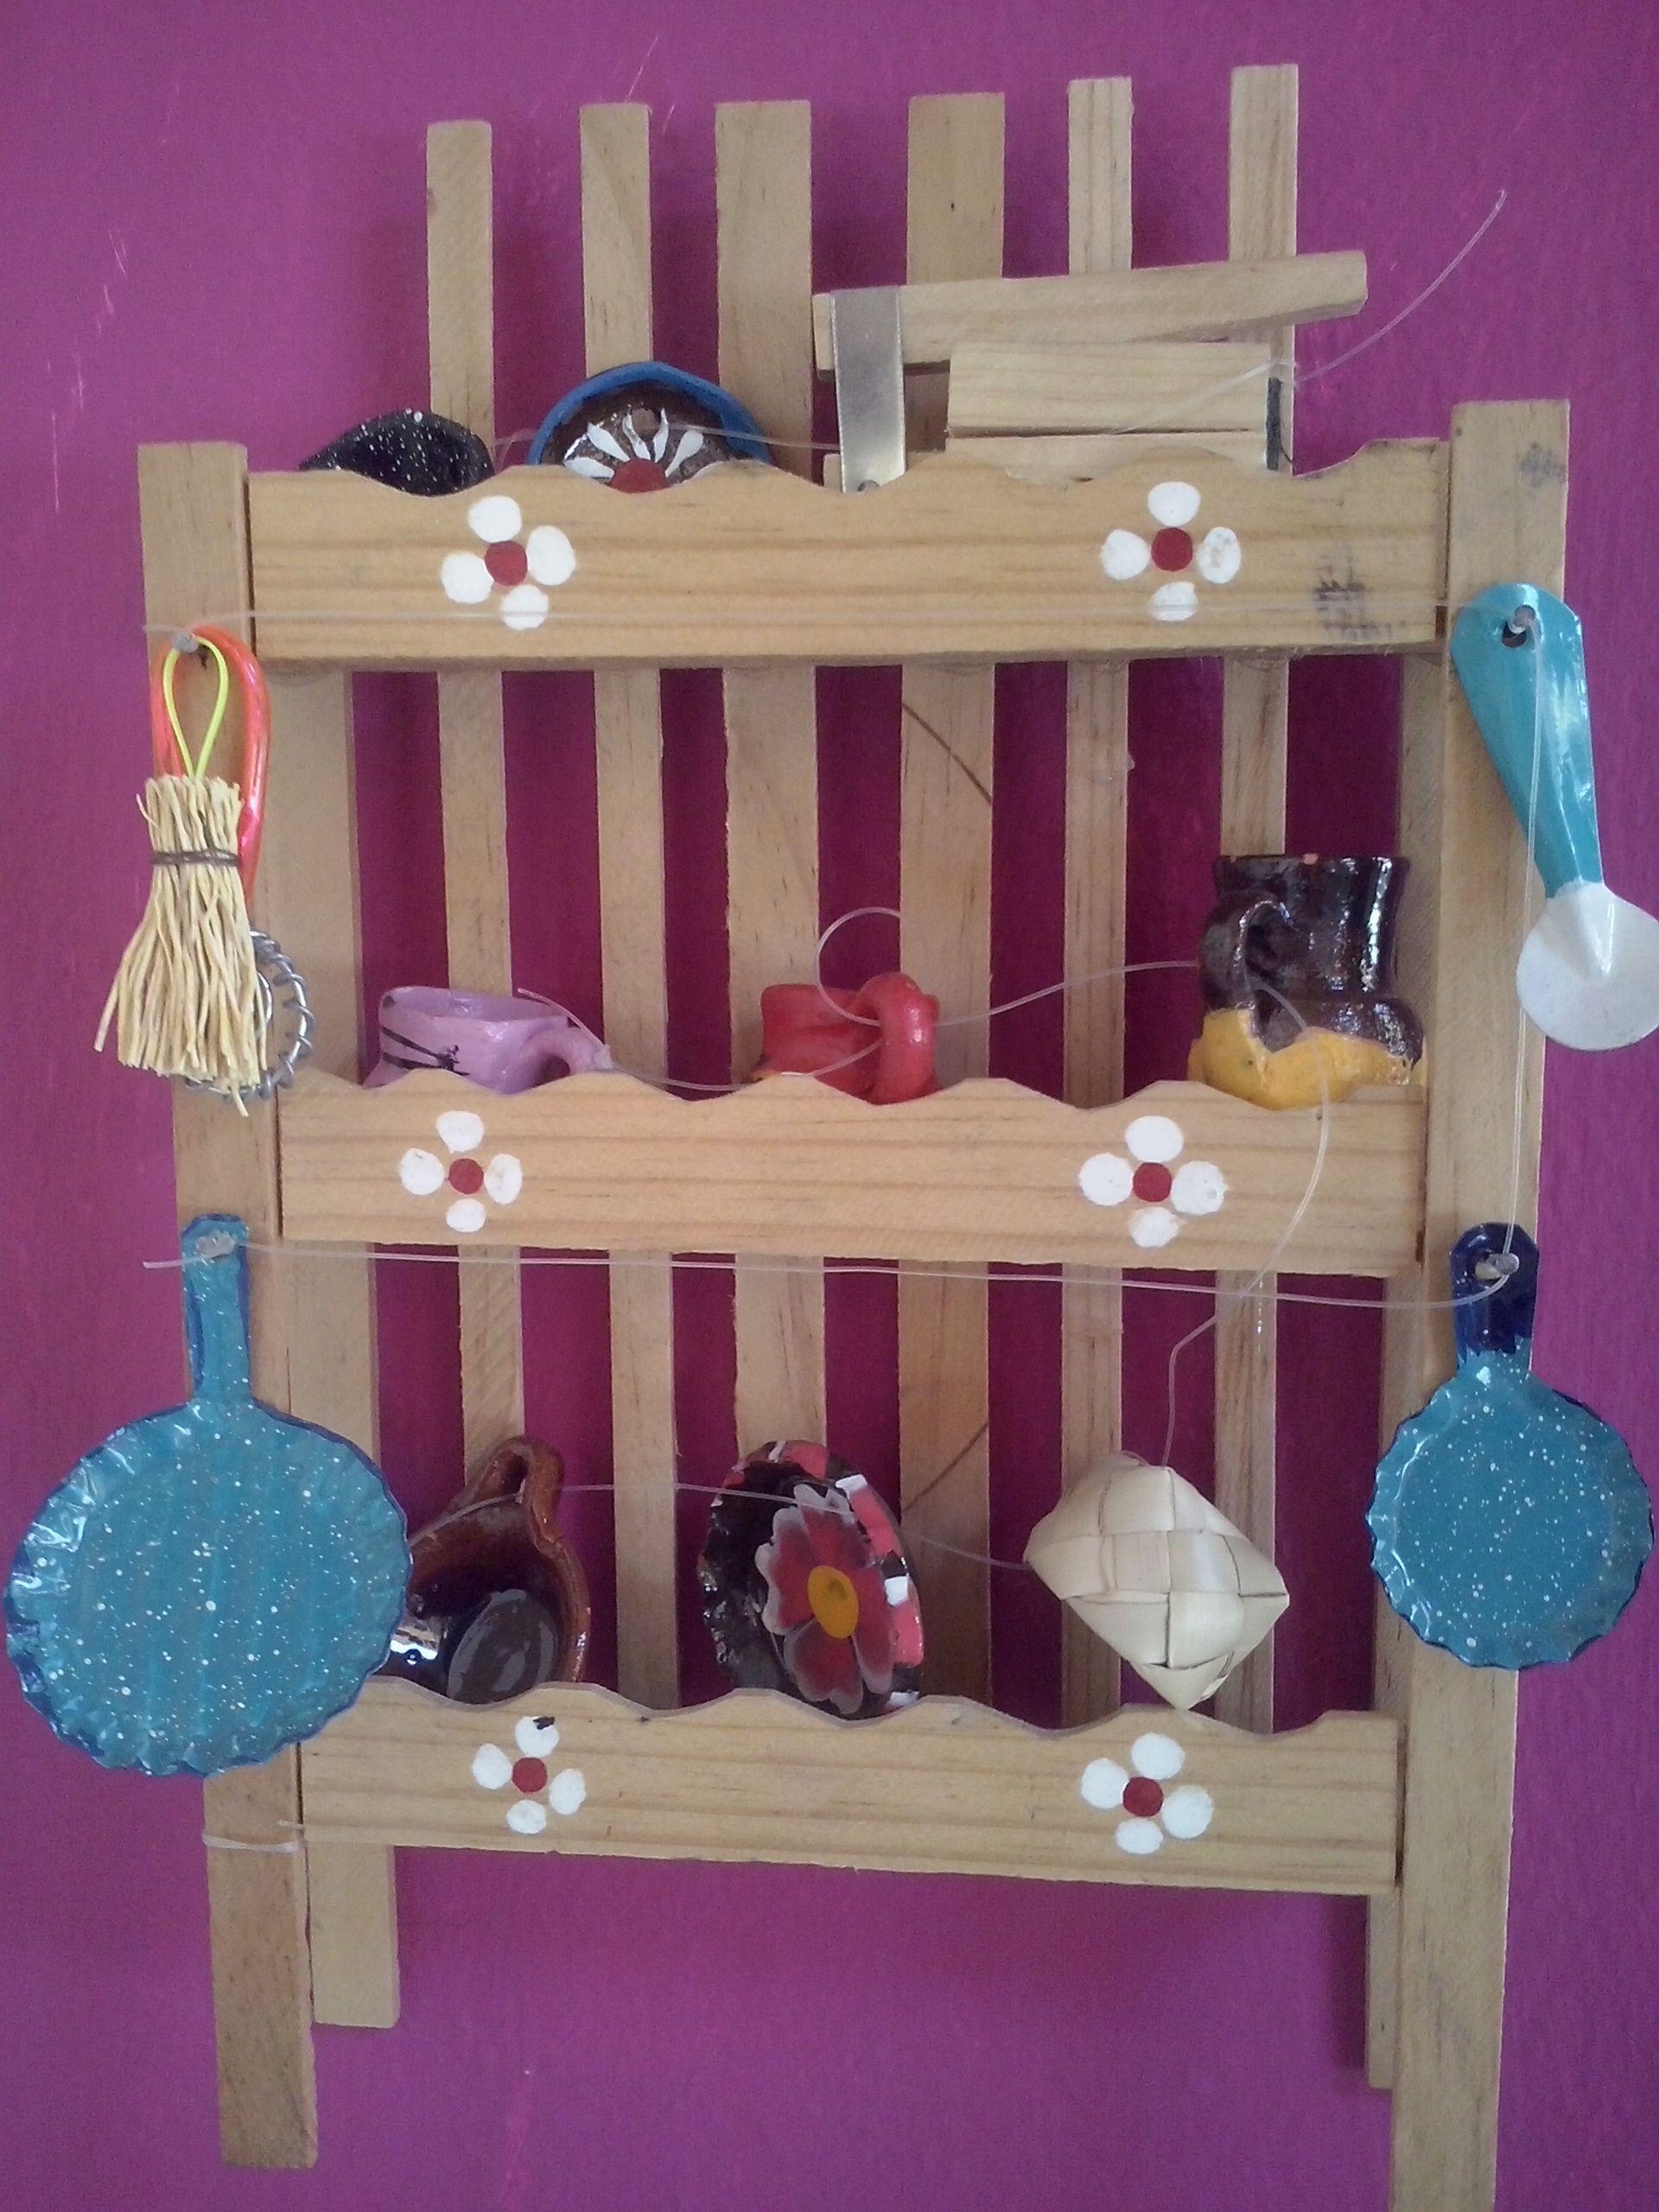 Artesania mexicana juguete para ni as trastero mi for Trasteros de madera